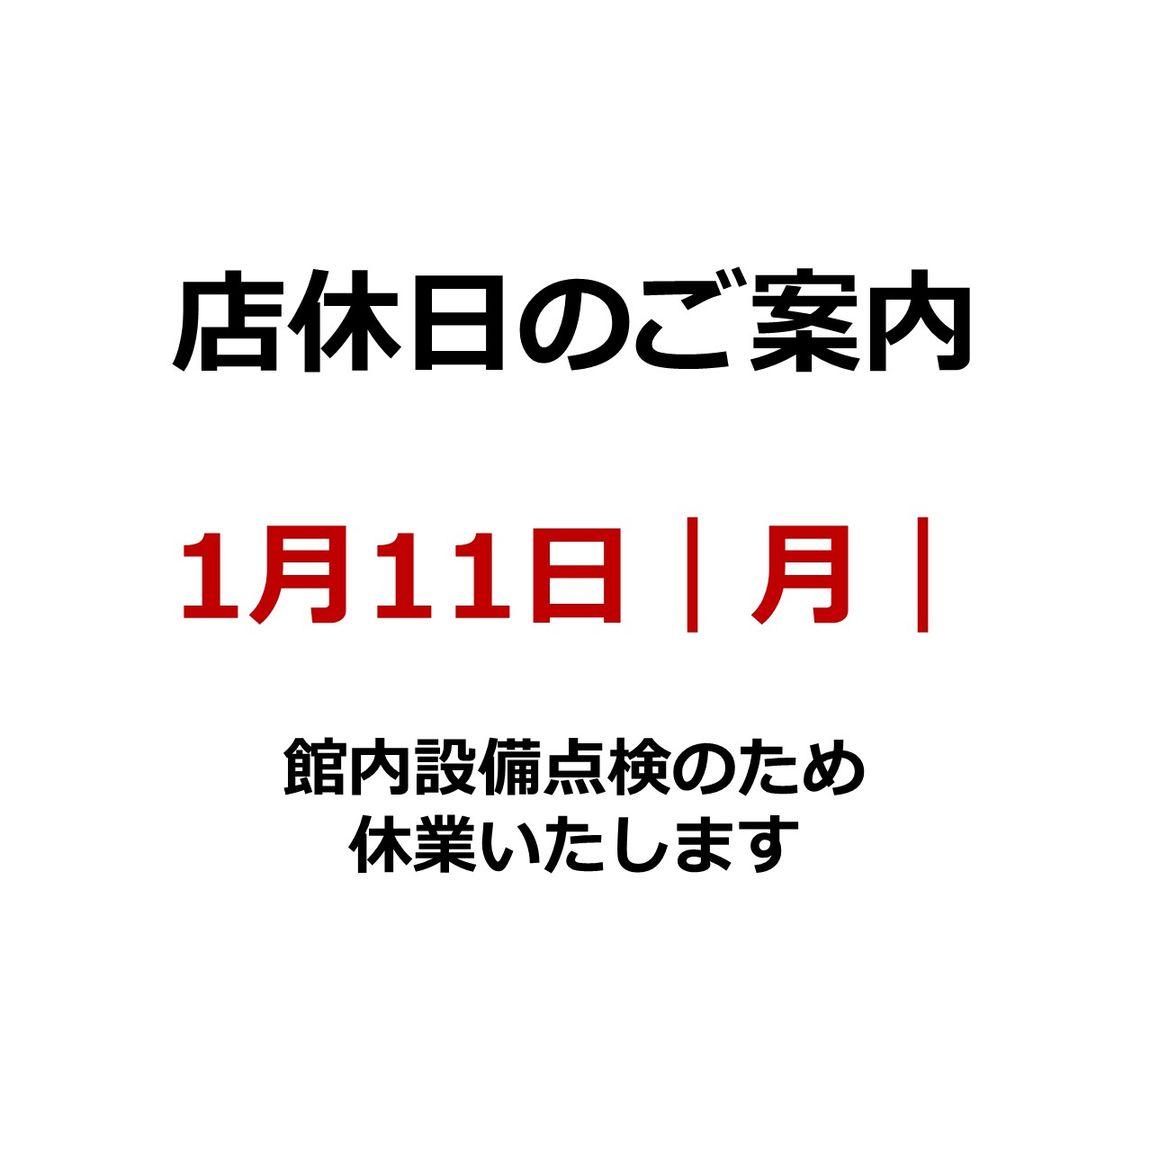 45953_20210109_005